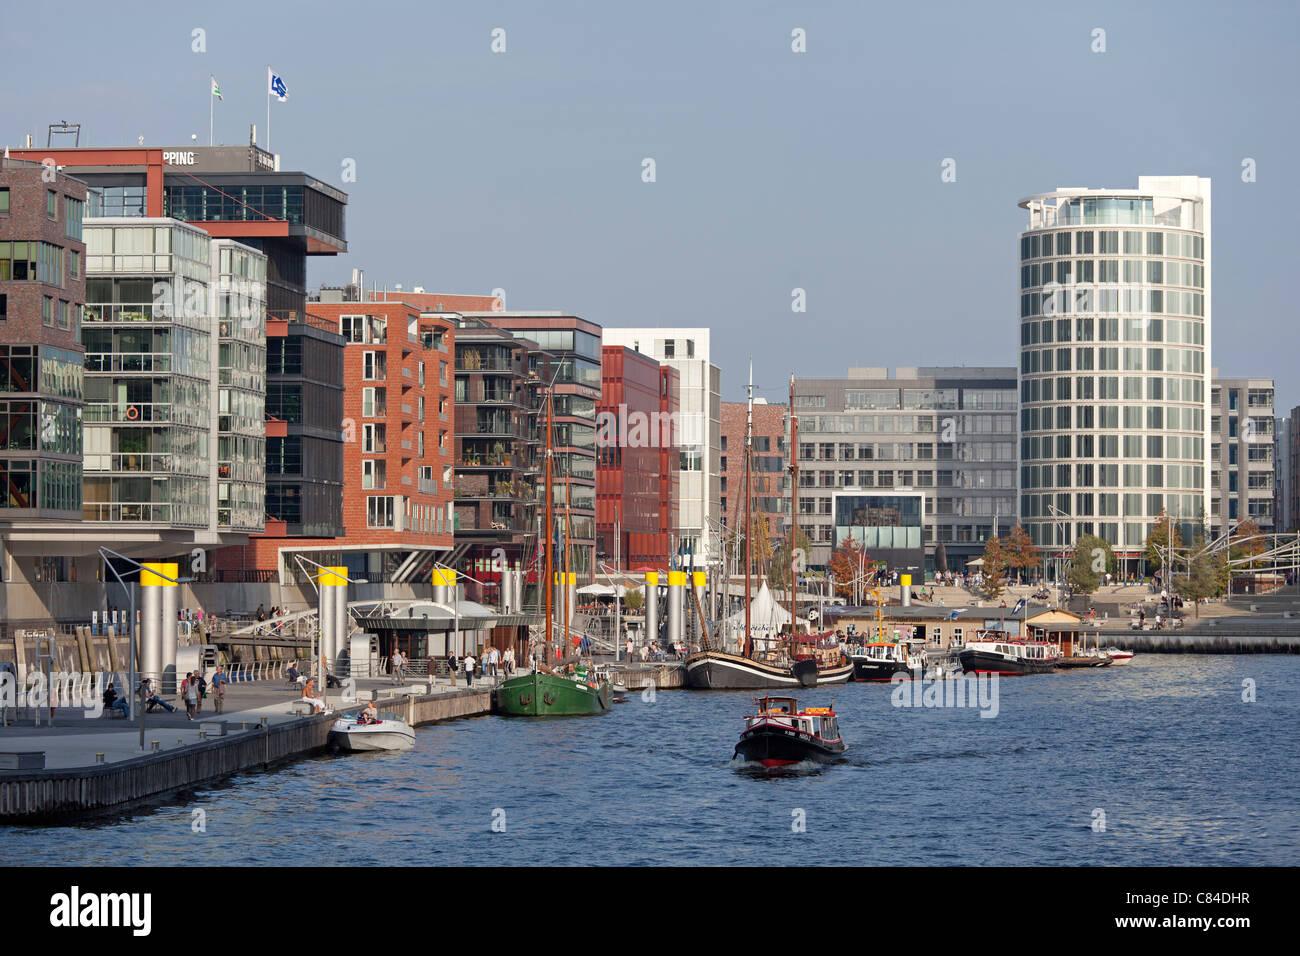 Sandtorkai, Hafencity (harbour city) , Hamburg, Germany - Stock Image